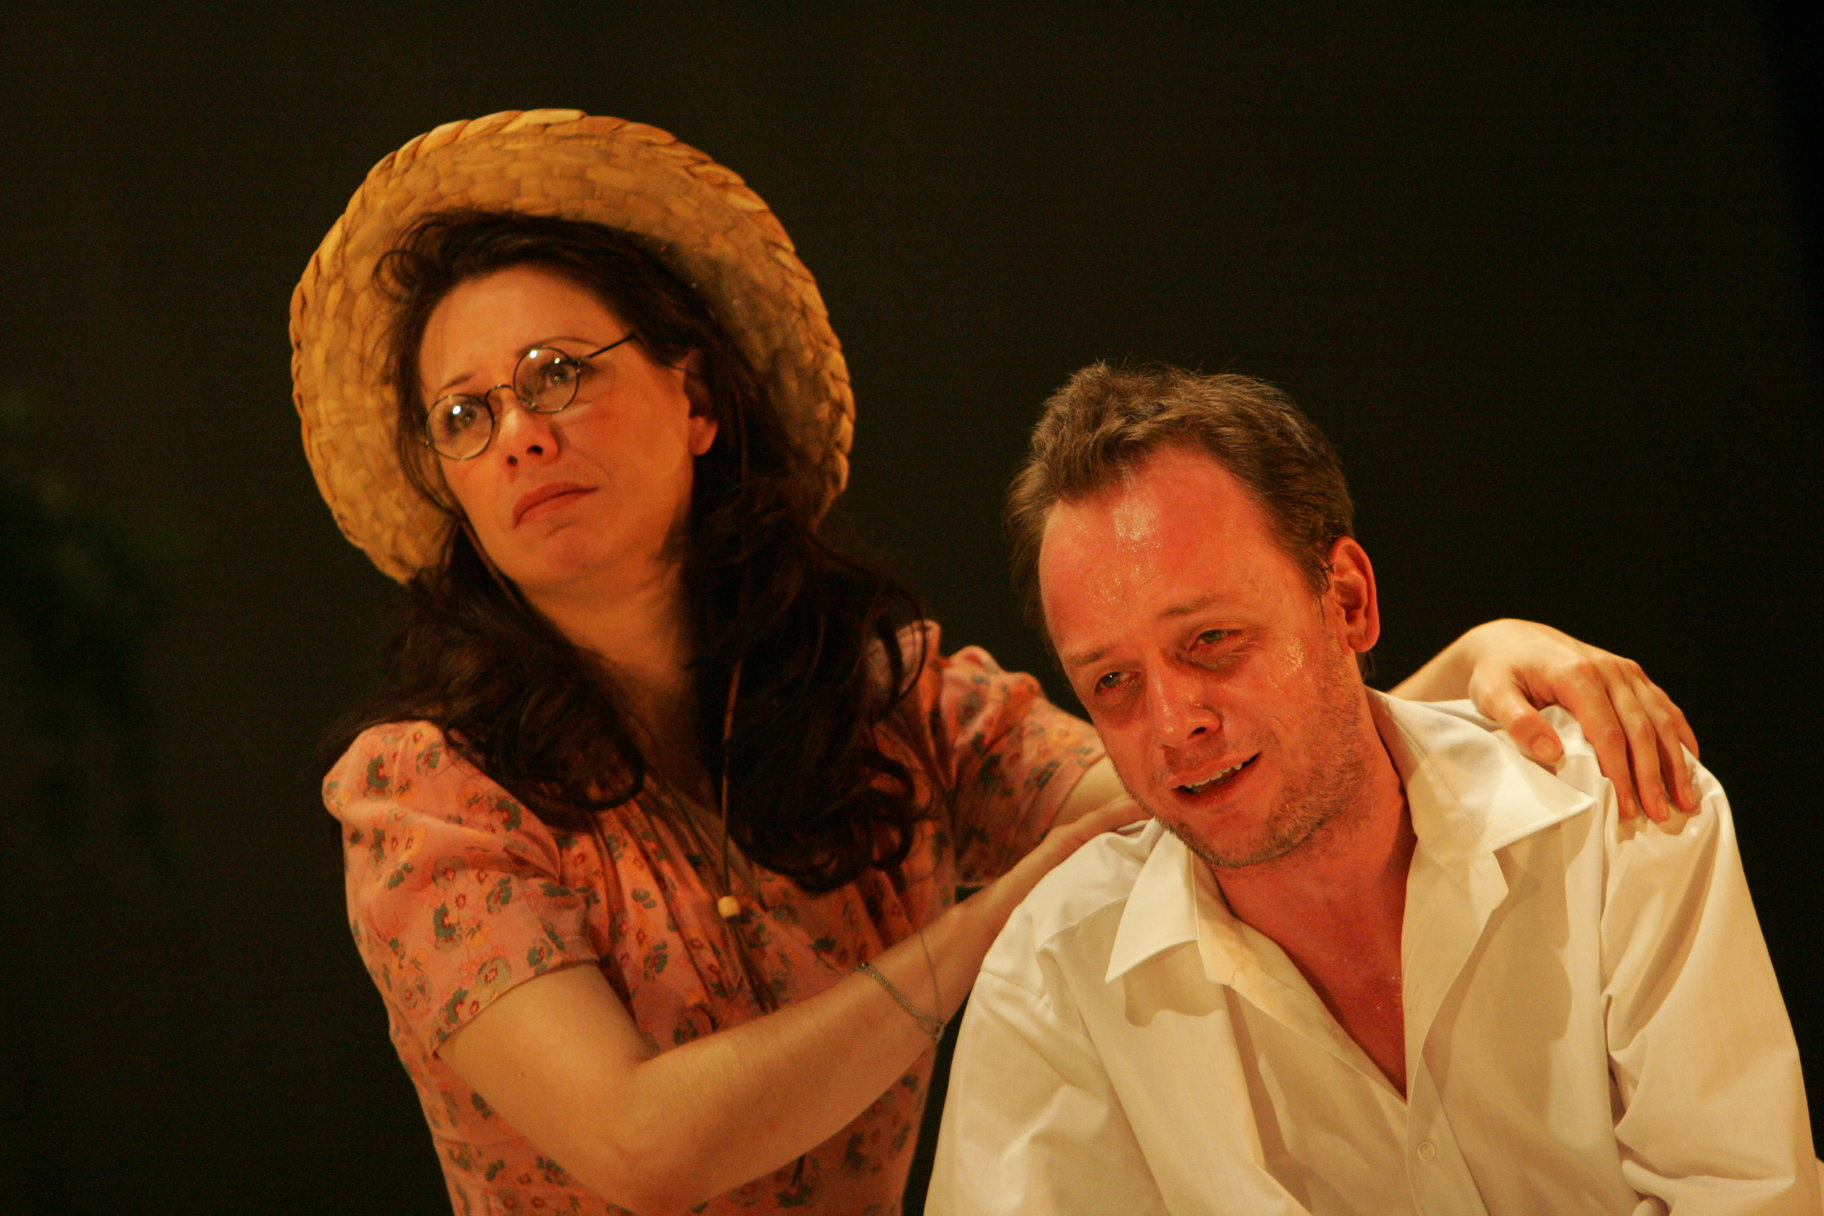 A woman comforts a sad man.